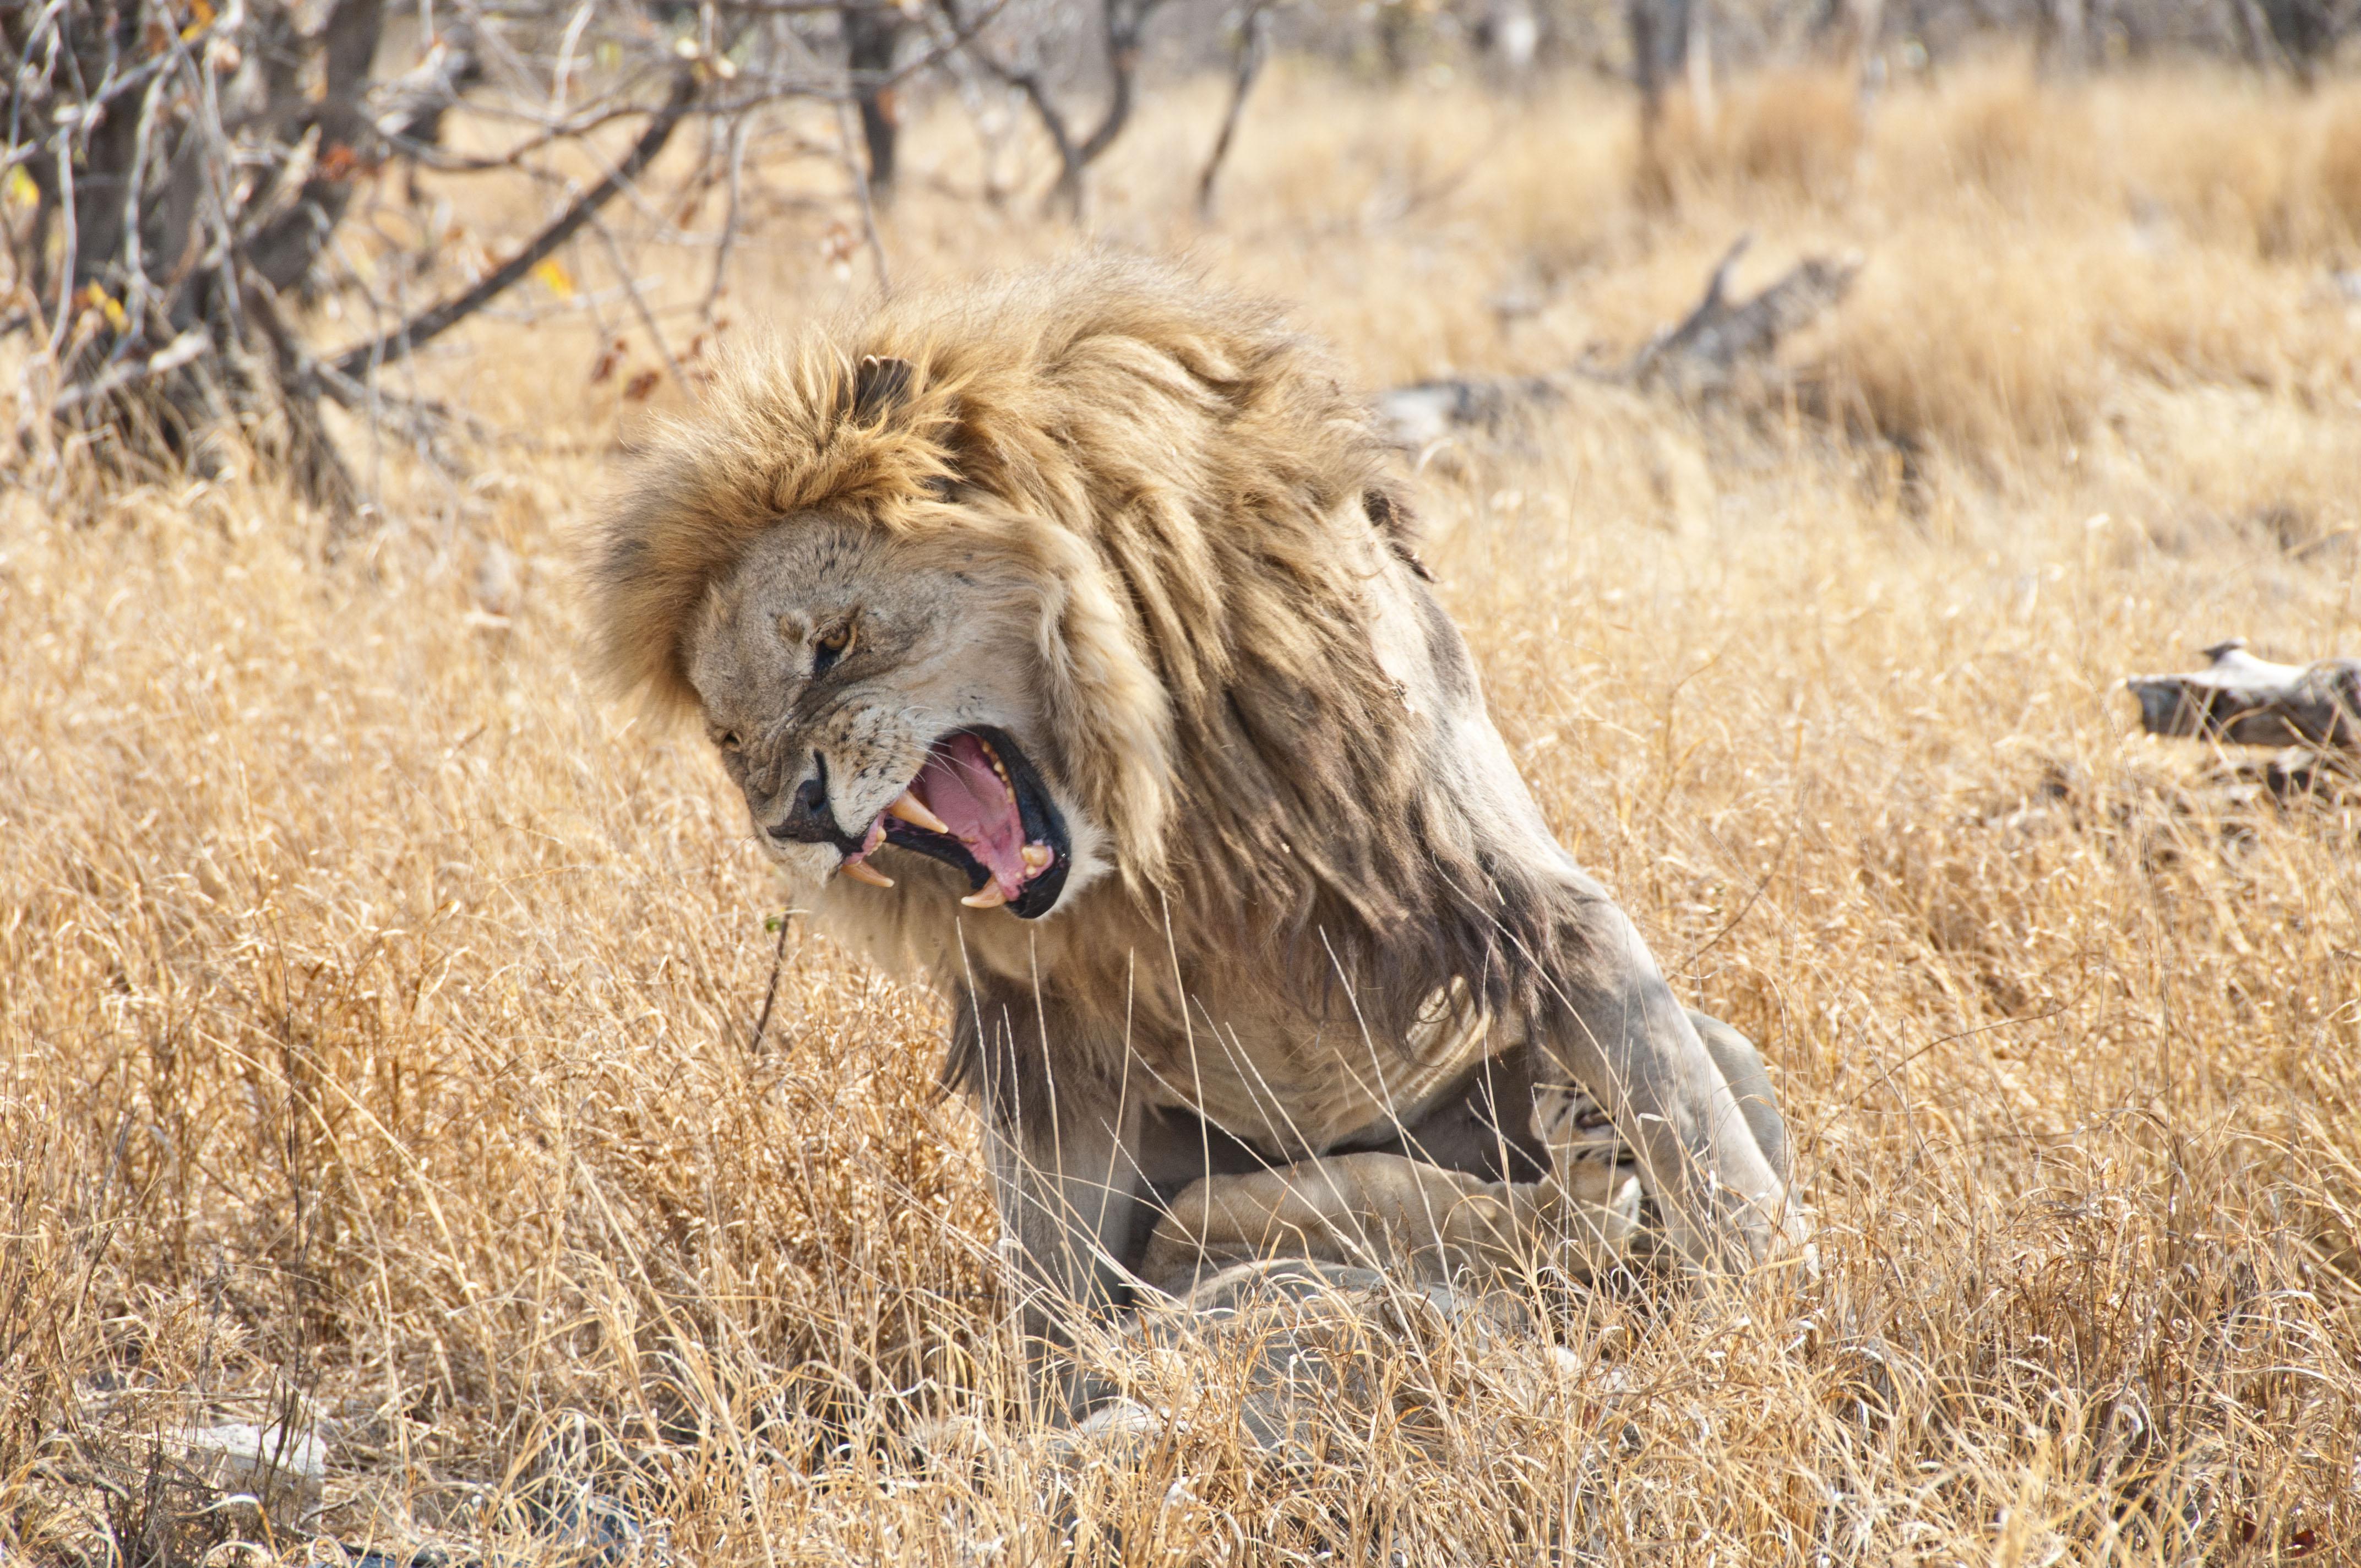 namibia_2014_kaokoveld-etoscha_107